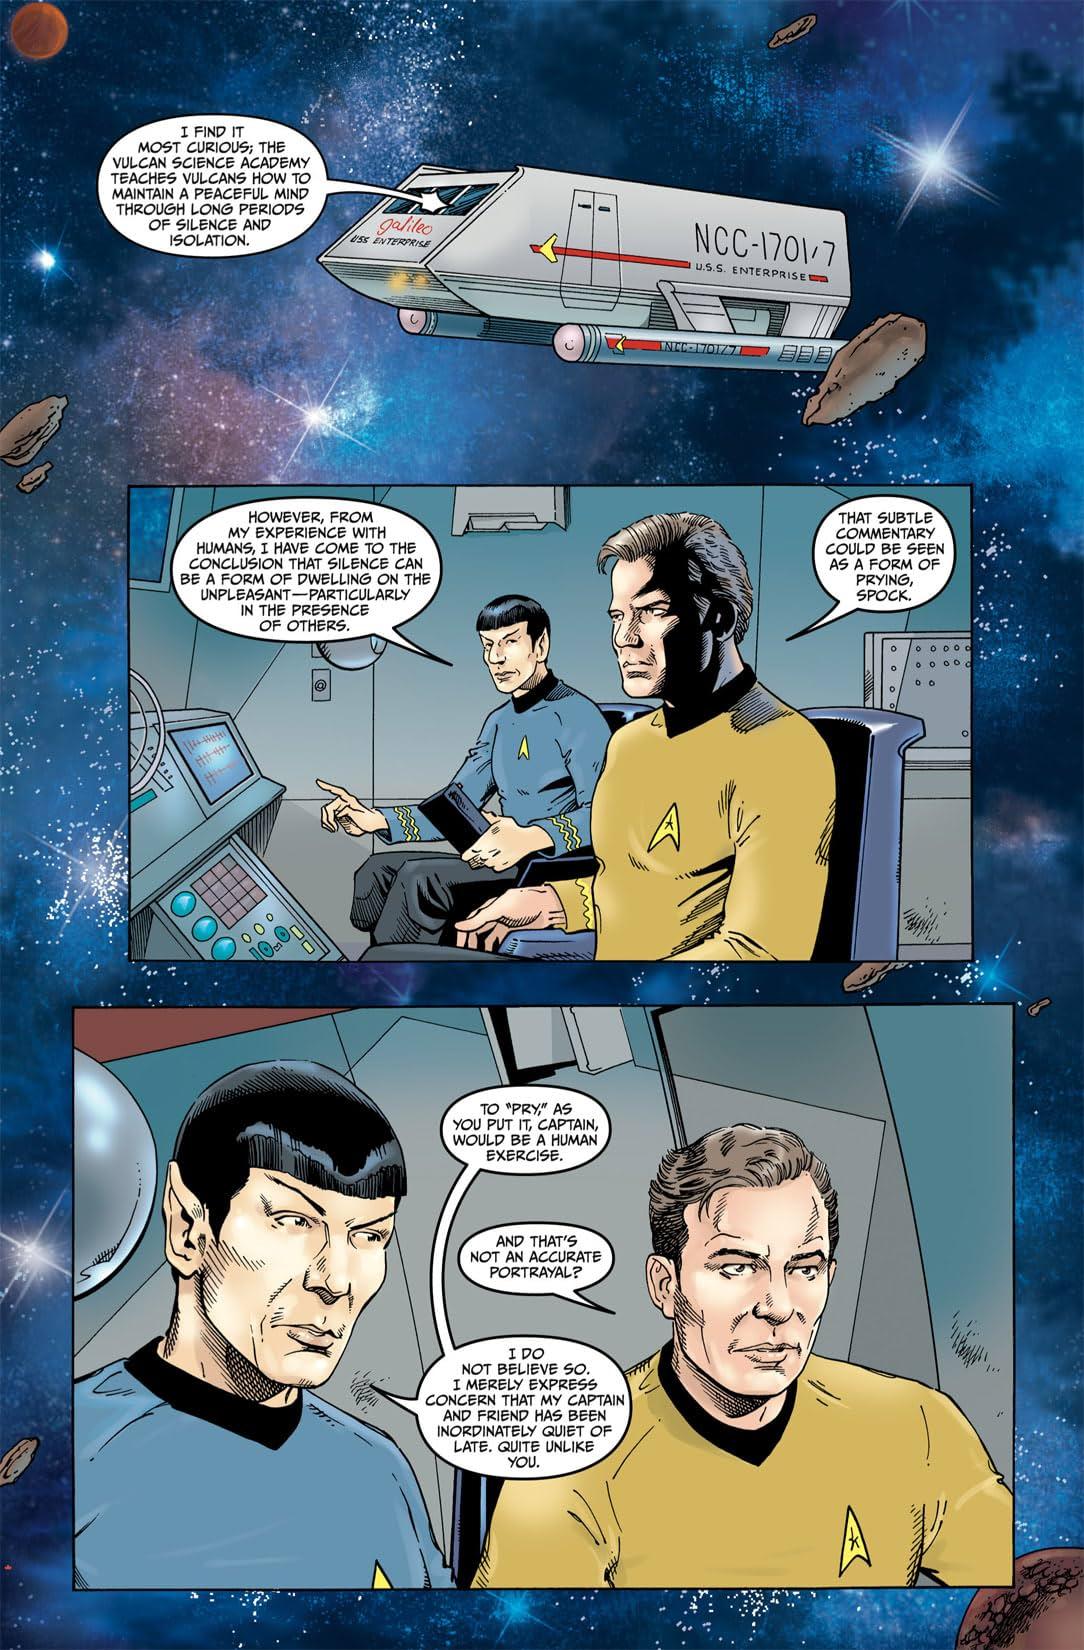 Star Trek: Year Four - The Enterprise Experiment #1